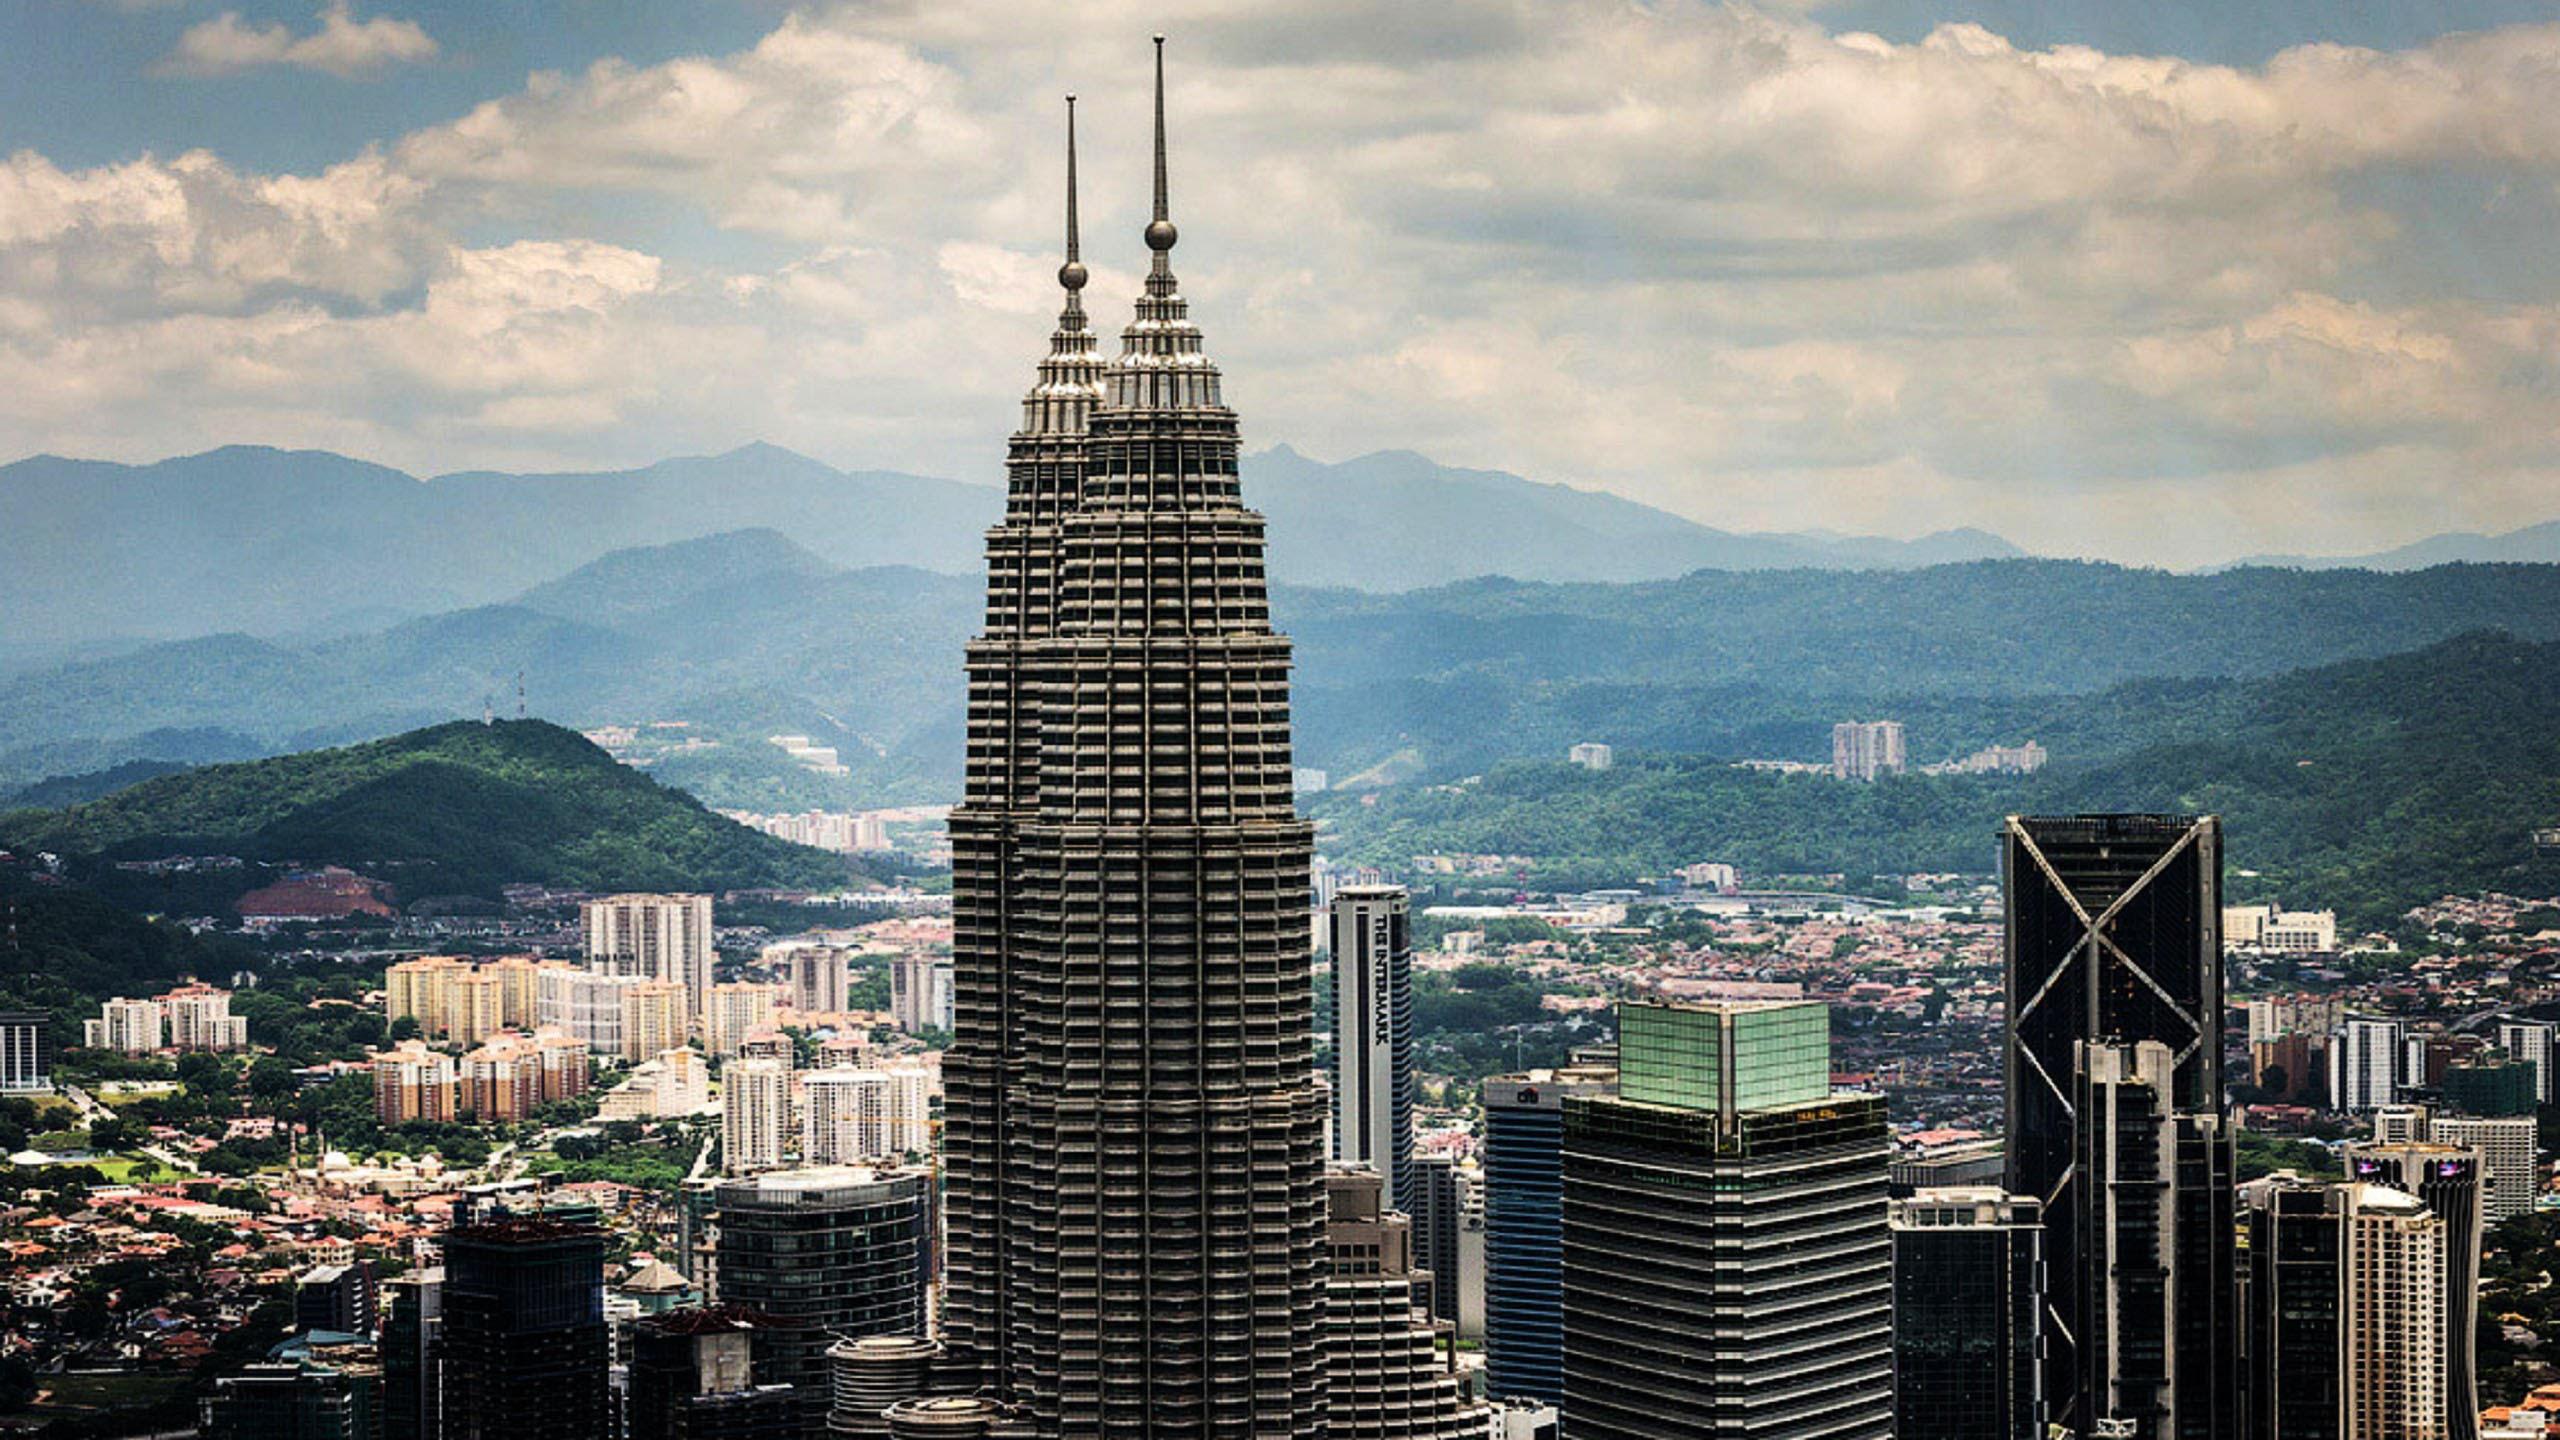 Kuala Lumpur Beautiful Hd Wallpapers: Kuala Lumpur Wallpapers